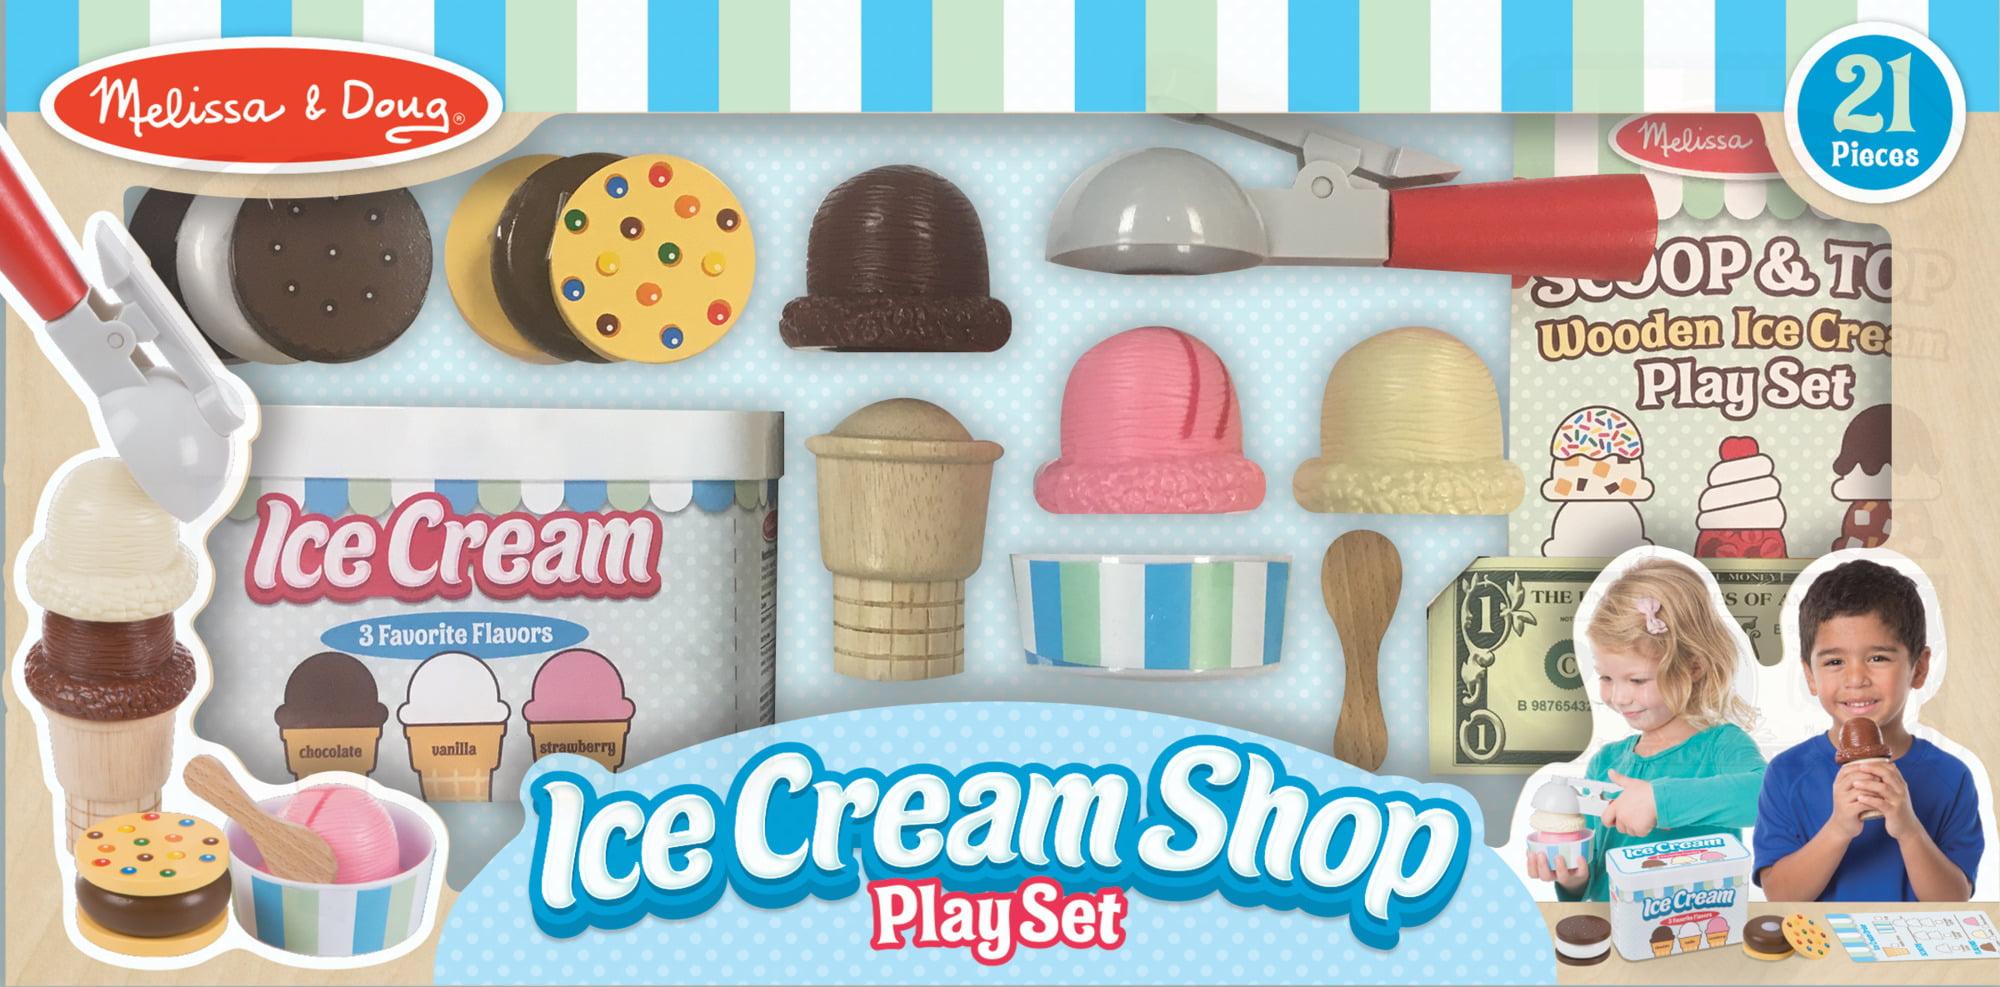 Melissa Doug 21 Piece Ice Cream Shop Play Set